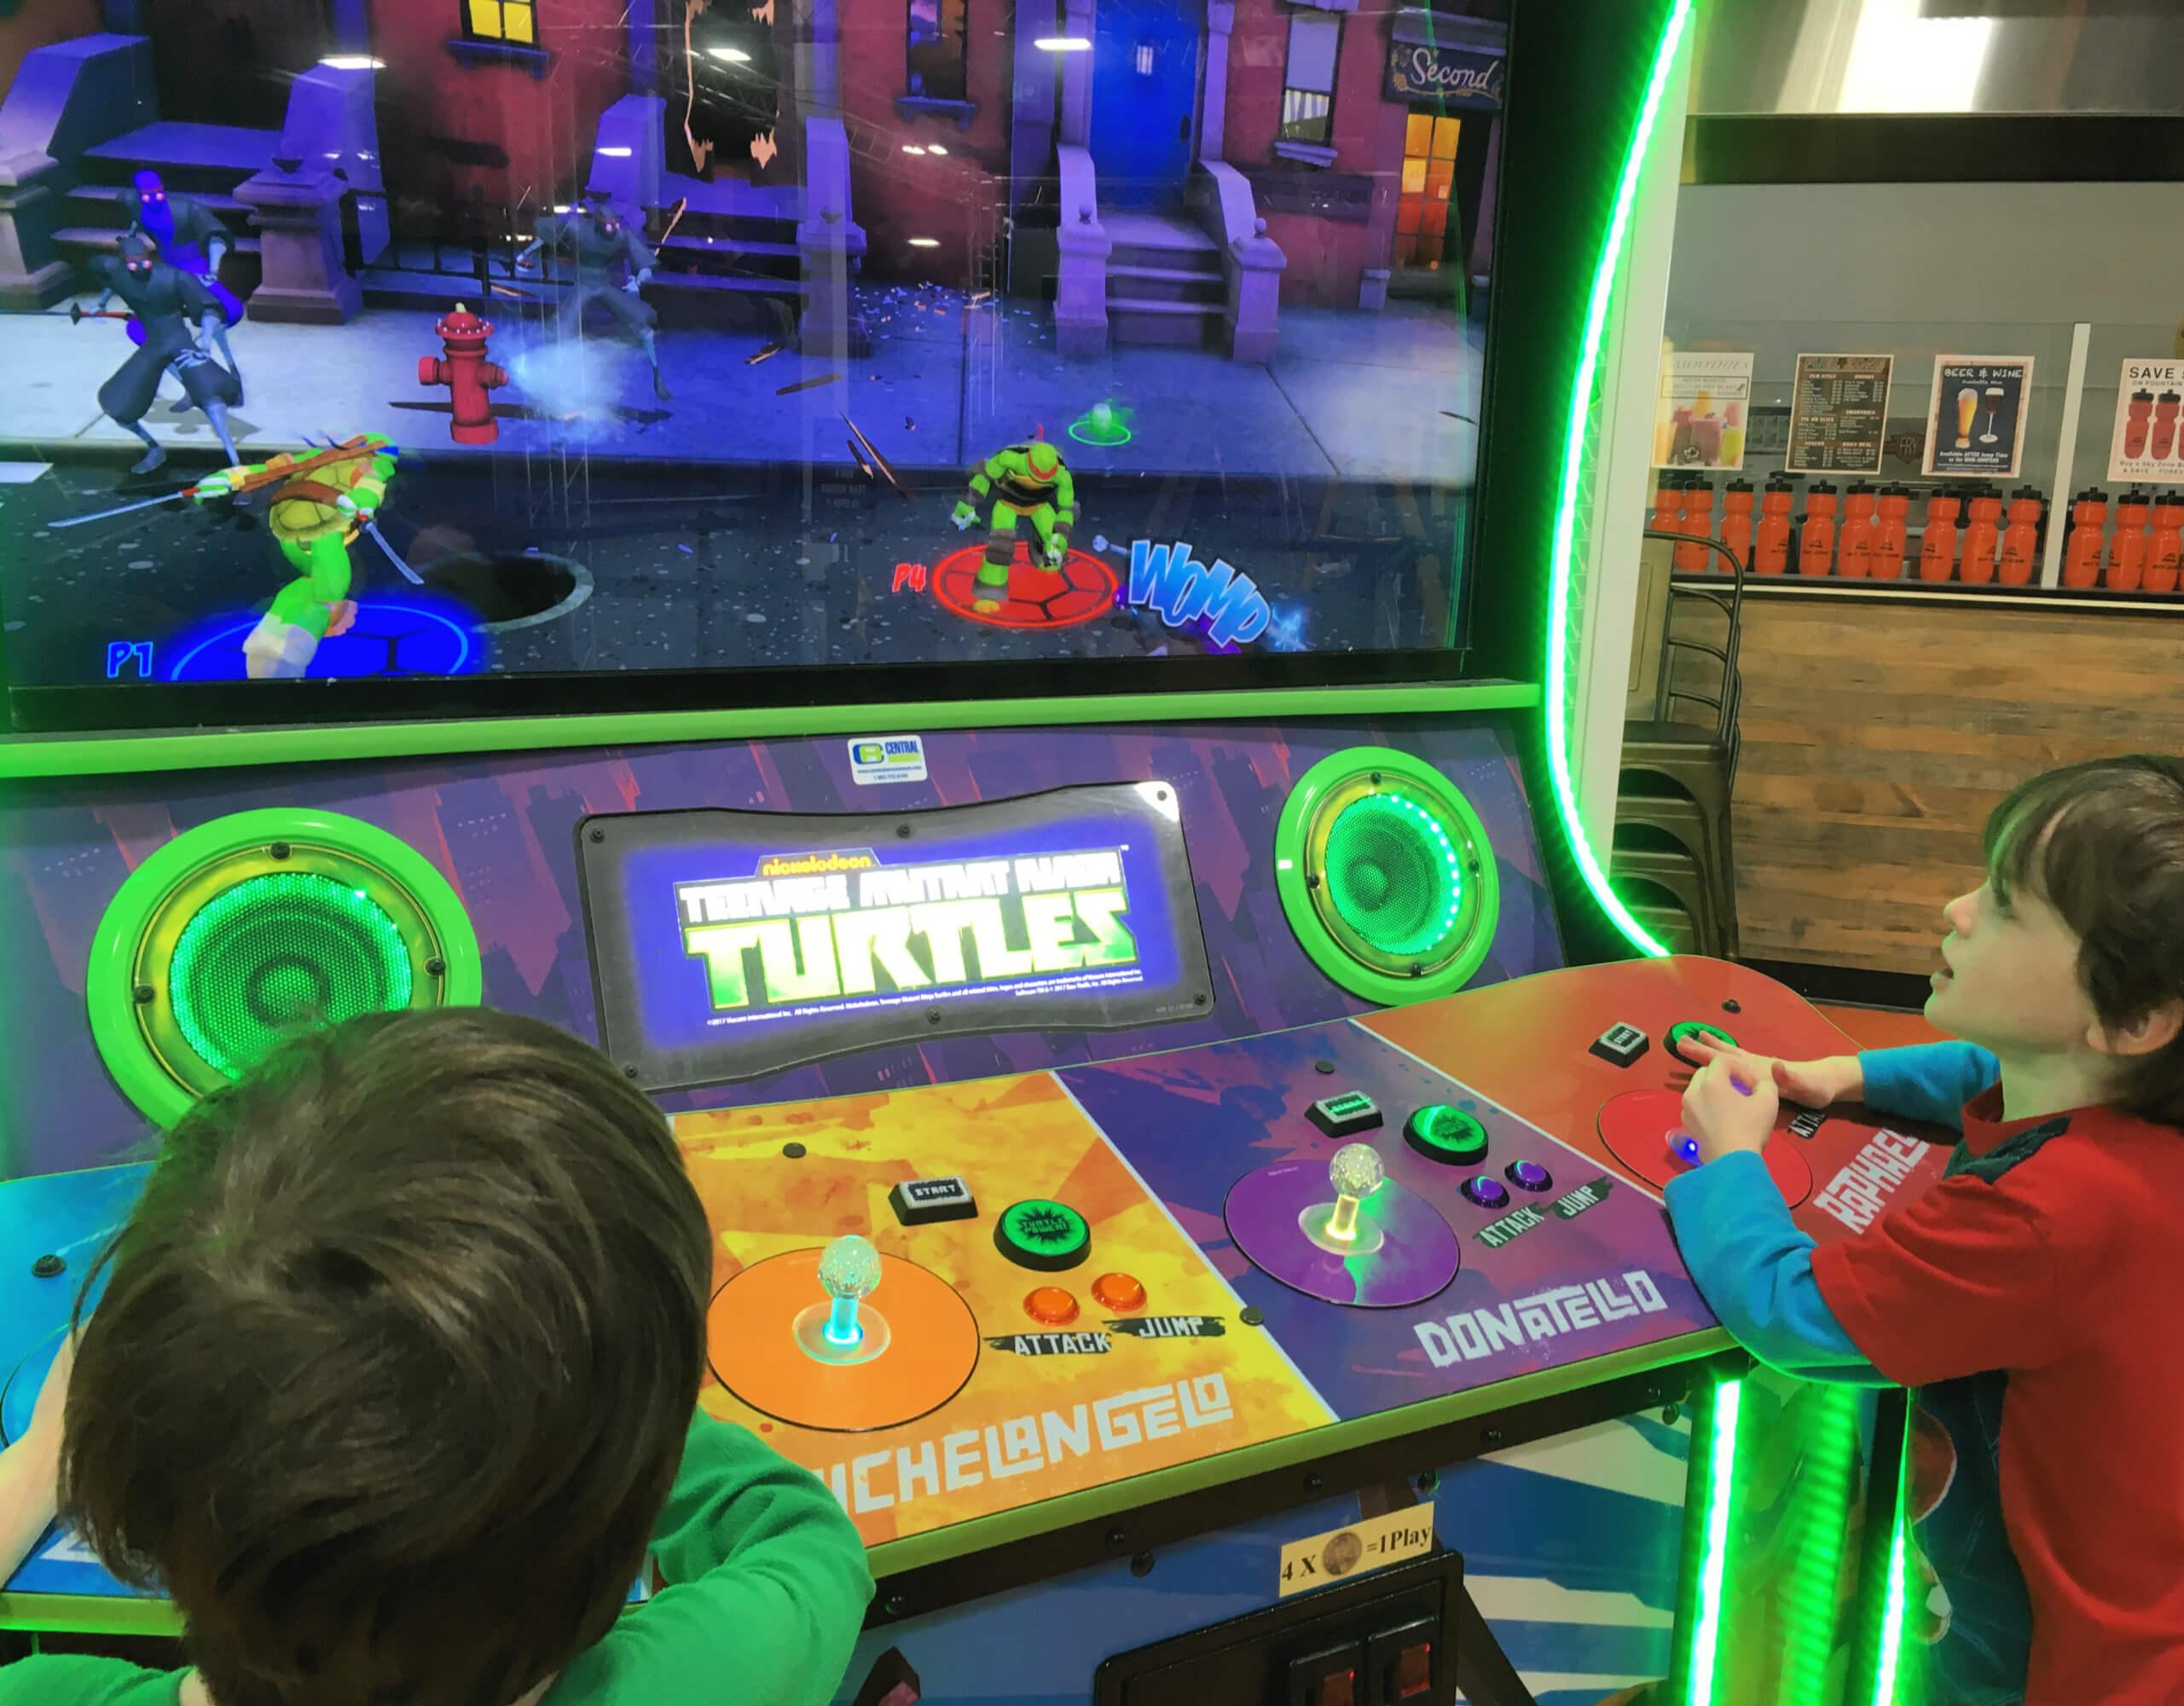 skyzone arcade moncton dieppe ninja turtle game kids